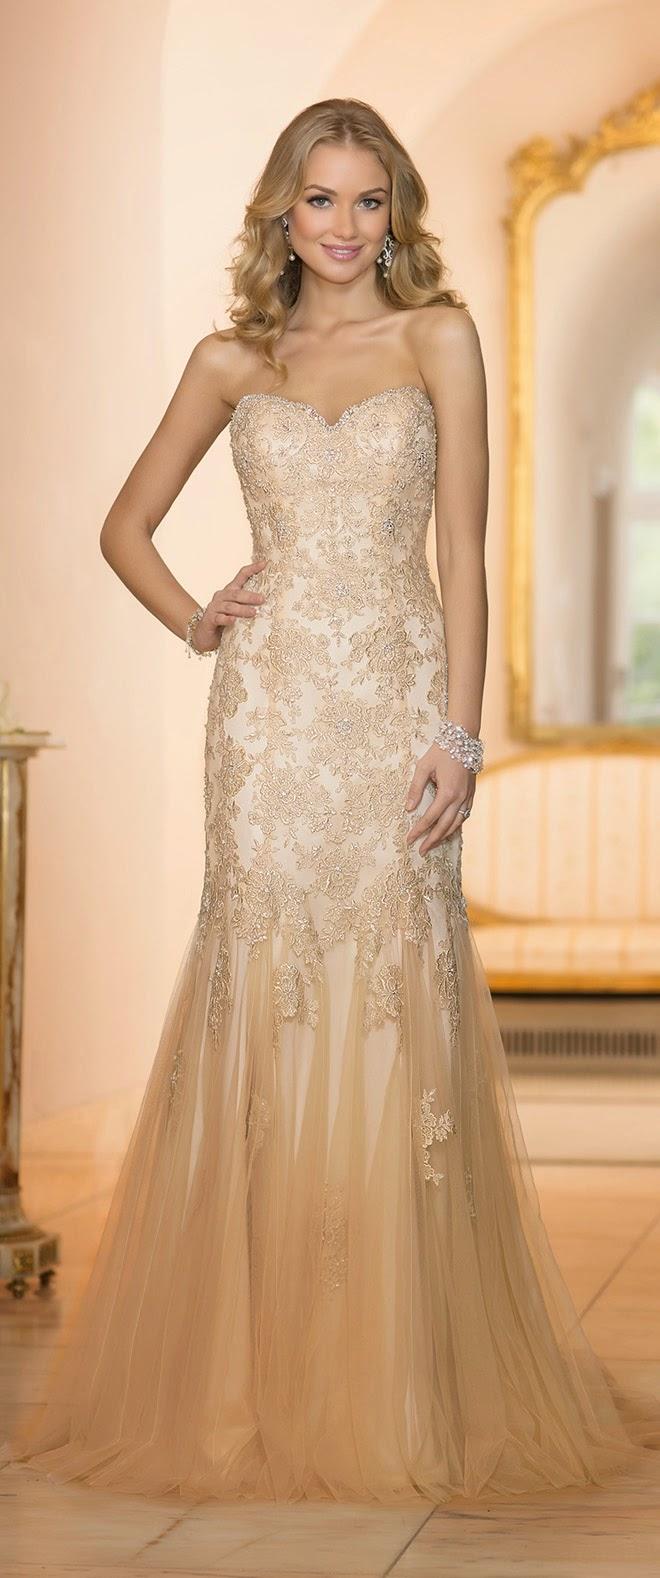 Stela York Weding Gown 02 - Stela York Weding Gown